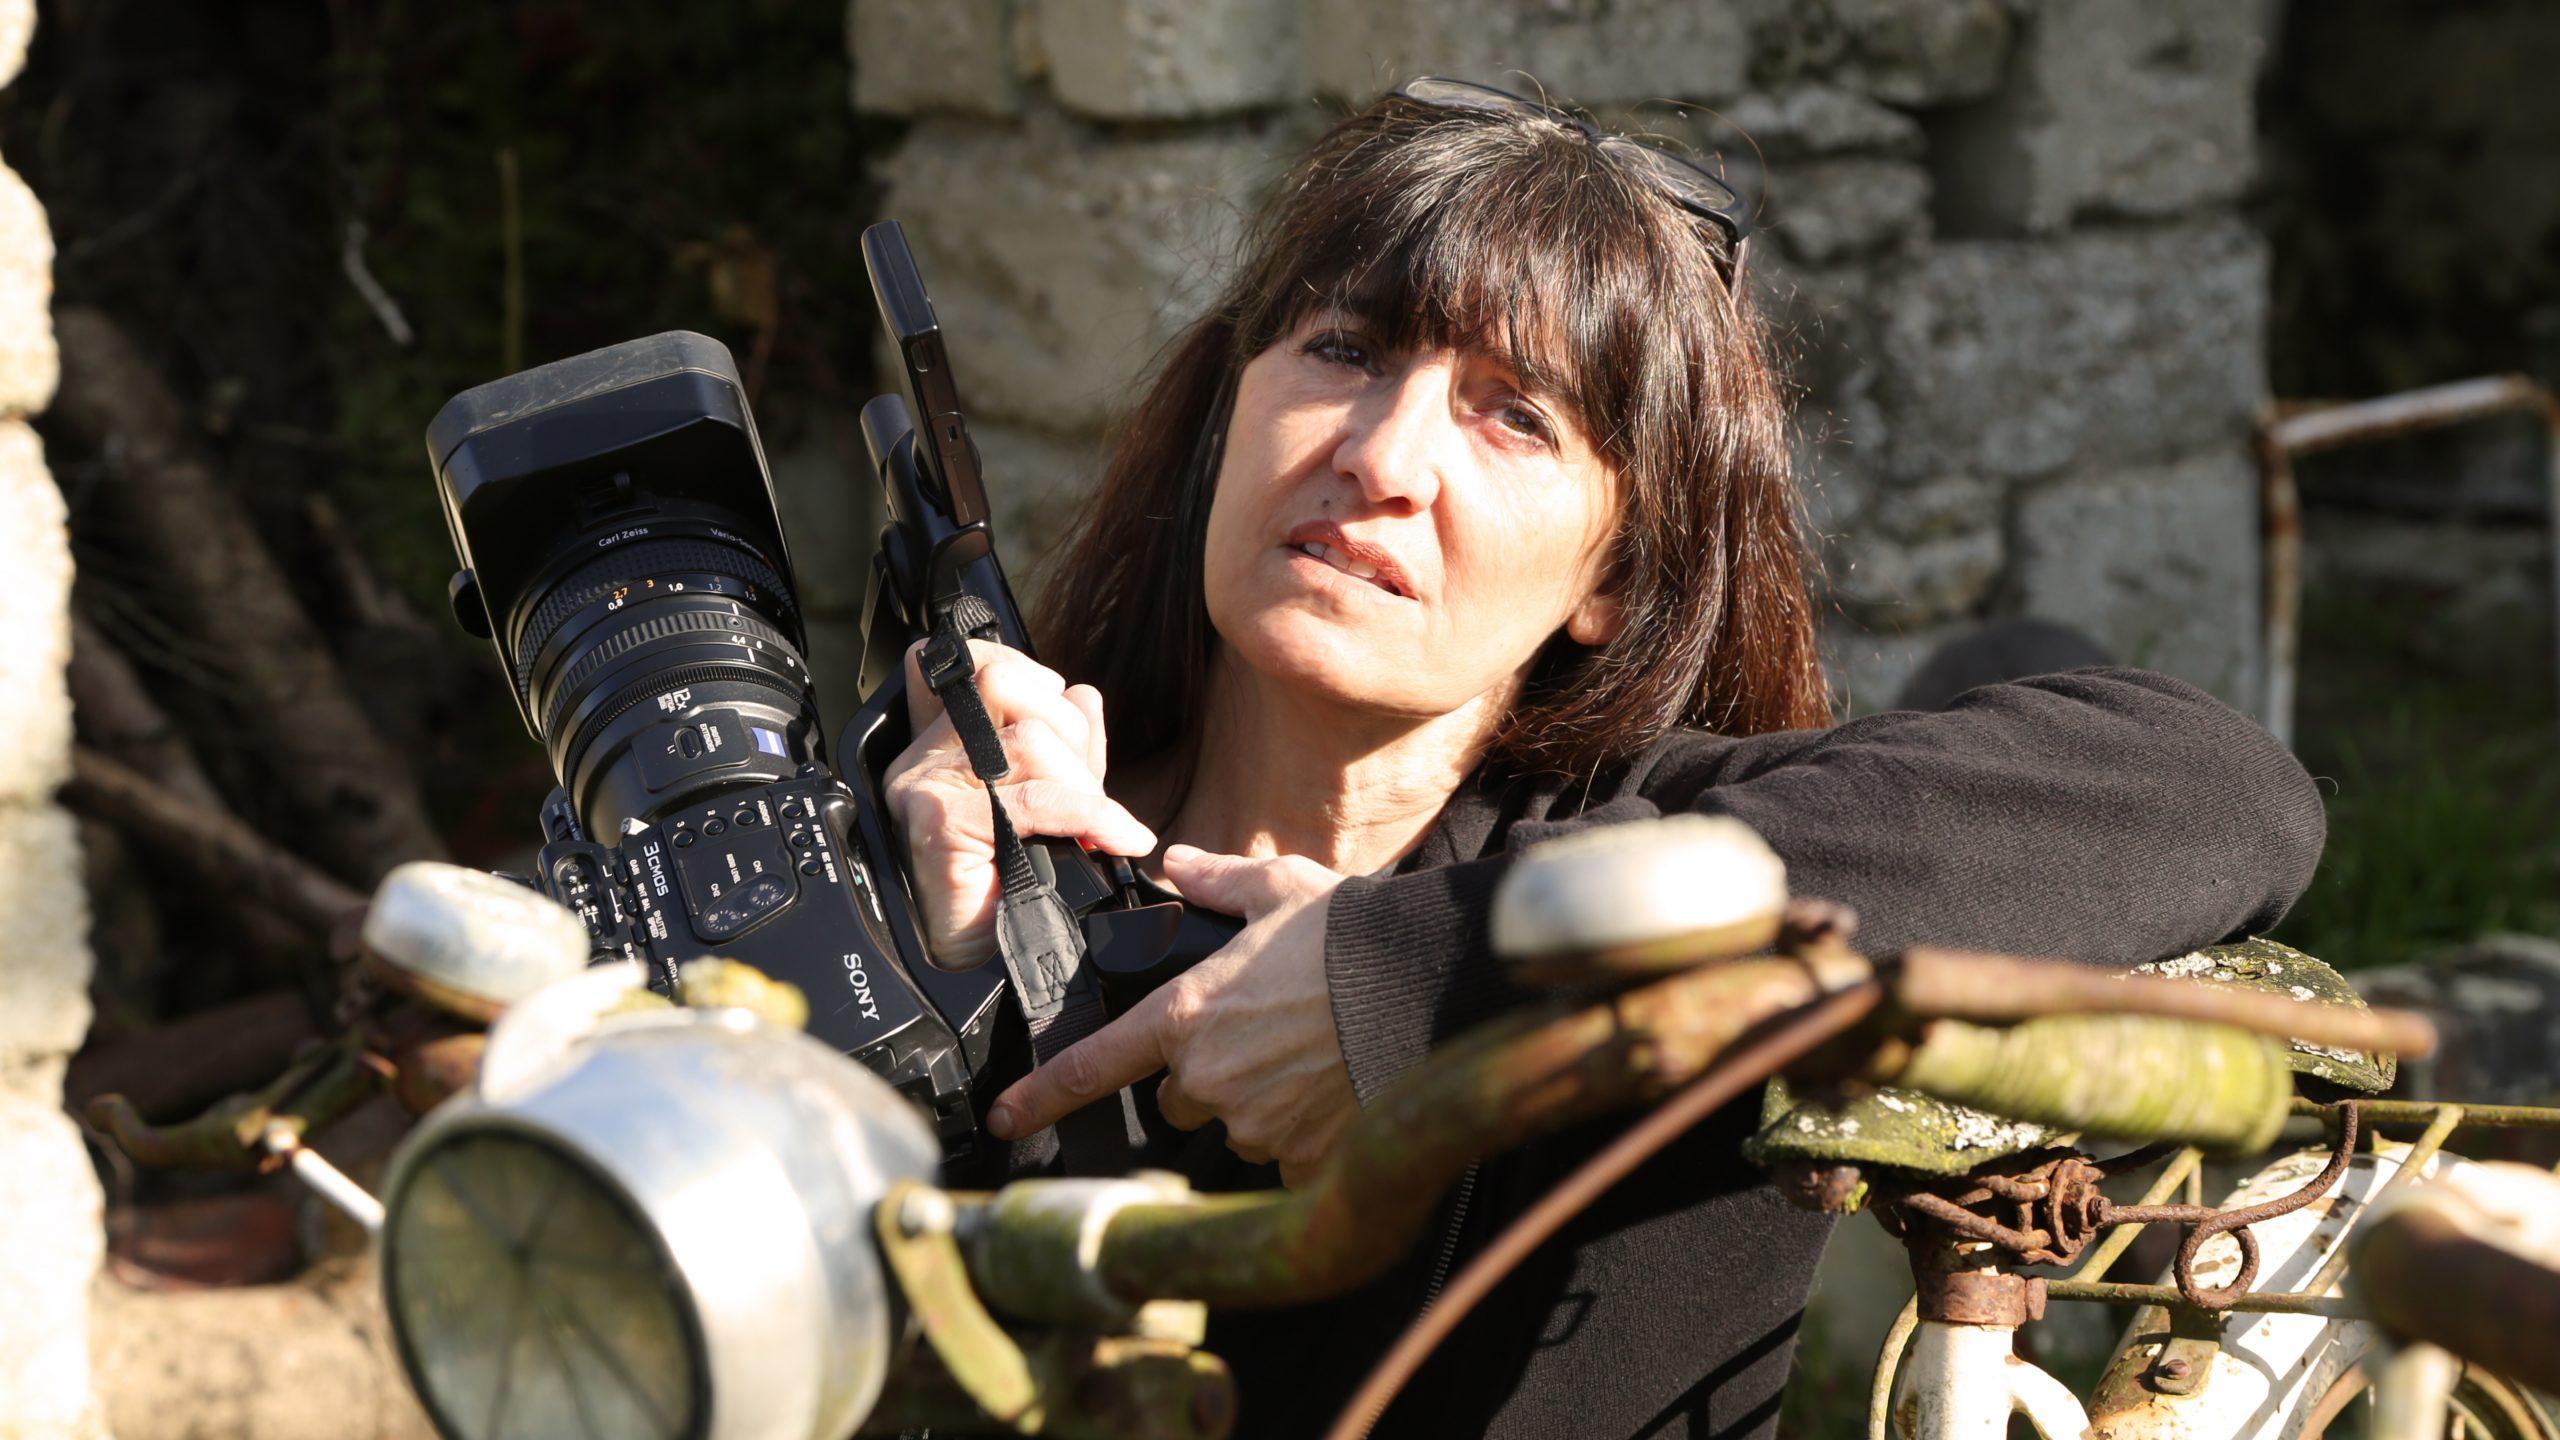 Balade capture vidéo - Emmanuelle Daude @ l'Avenue verte